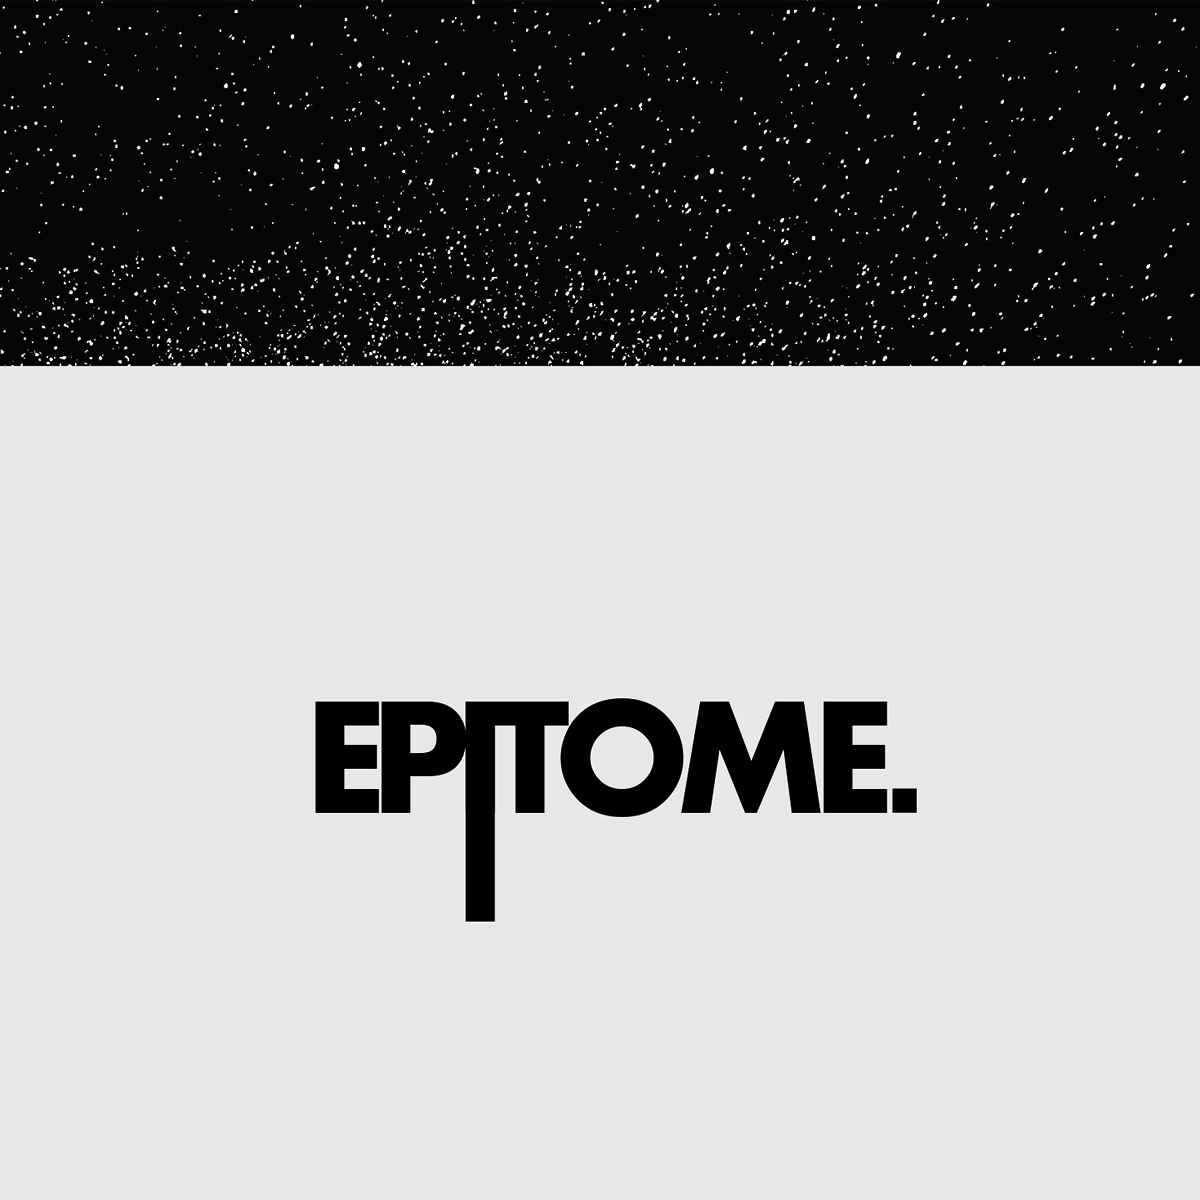 epitome,thisisepitome,branding ,Corporate Identity,typography  ,logo,design,storytelling